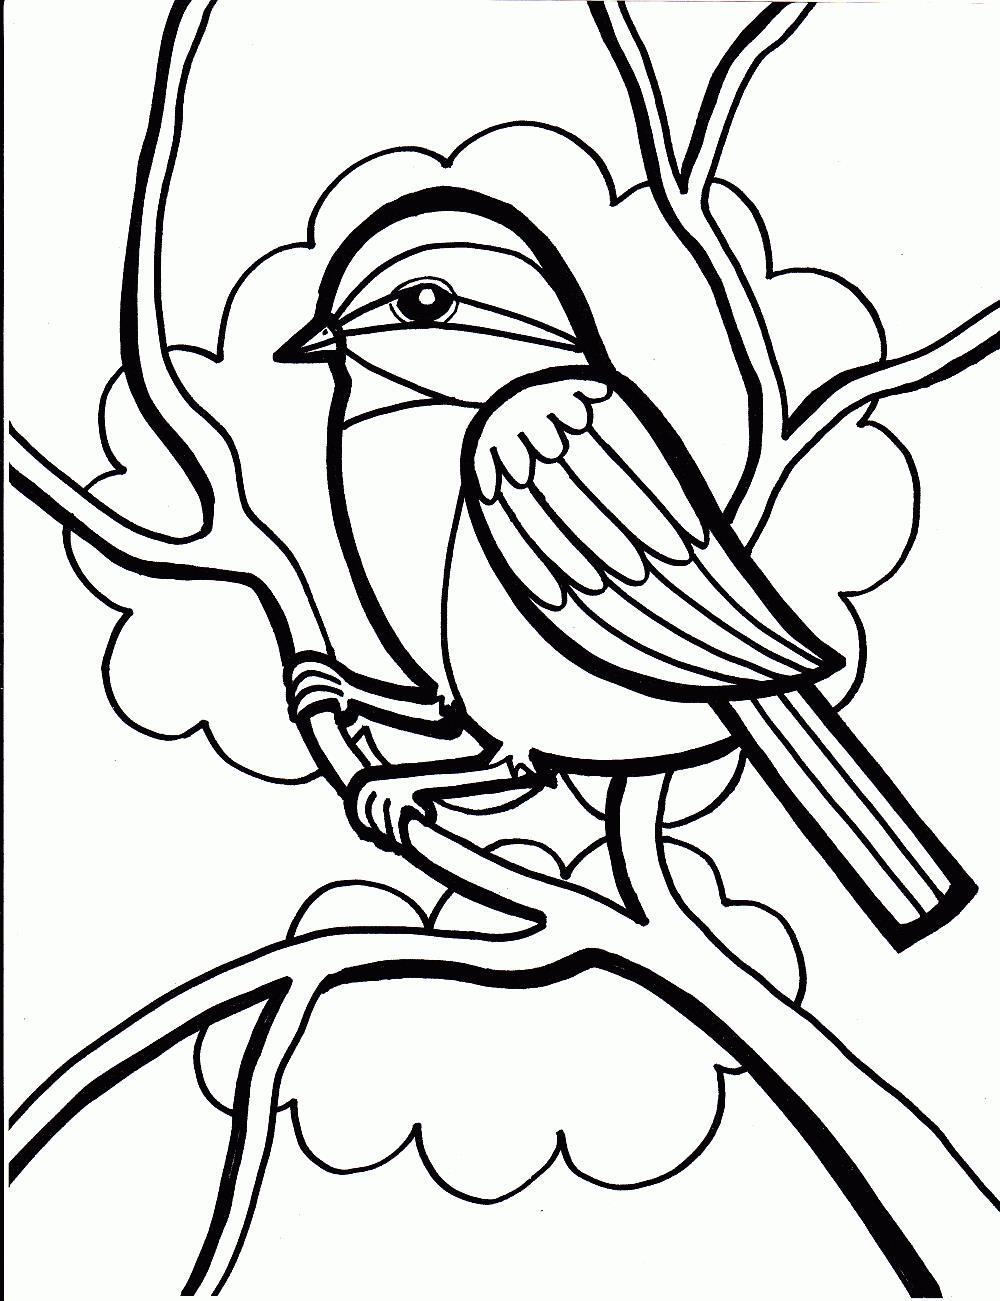 Птица Птица на ветке Раскраски для взрослых антистрессАнтистресс онлайн